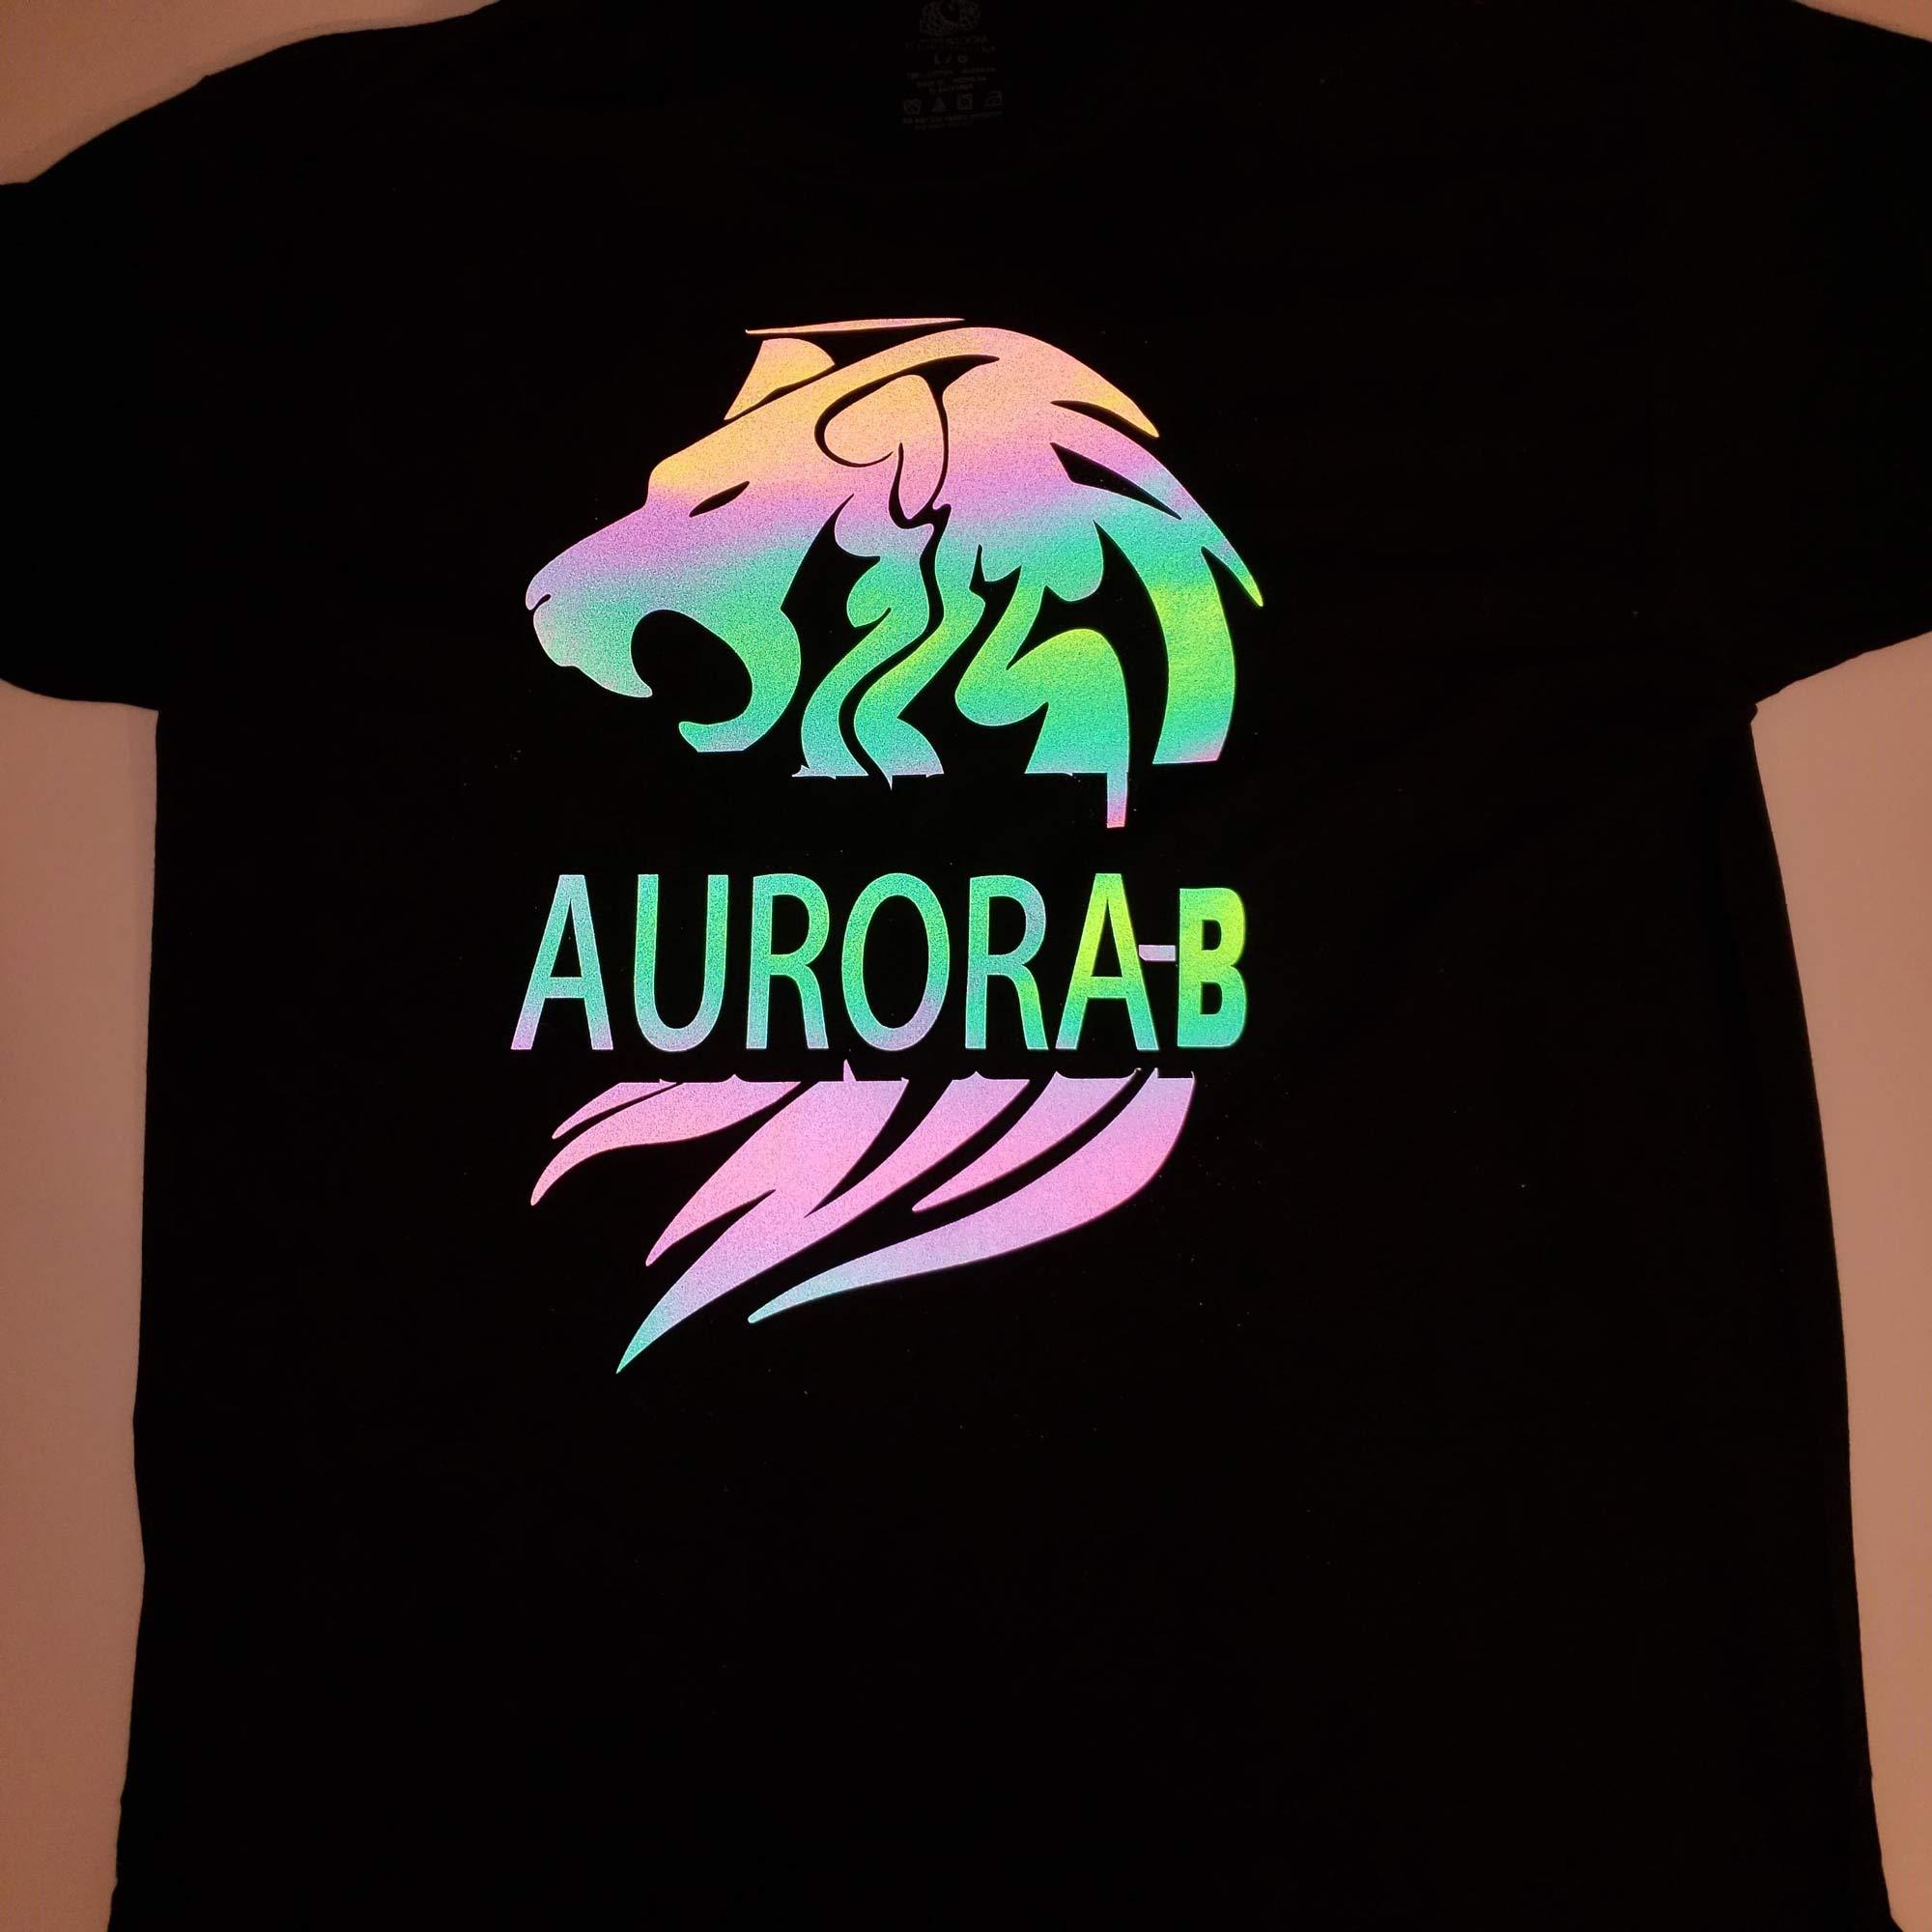 Results Aurora-B img-2